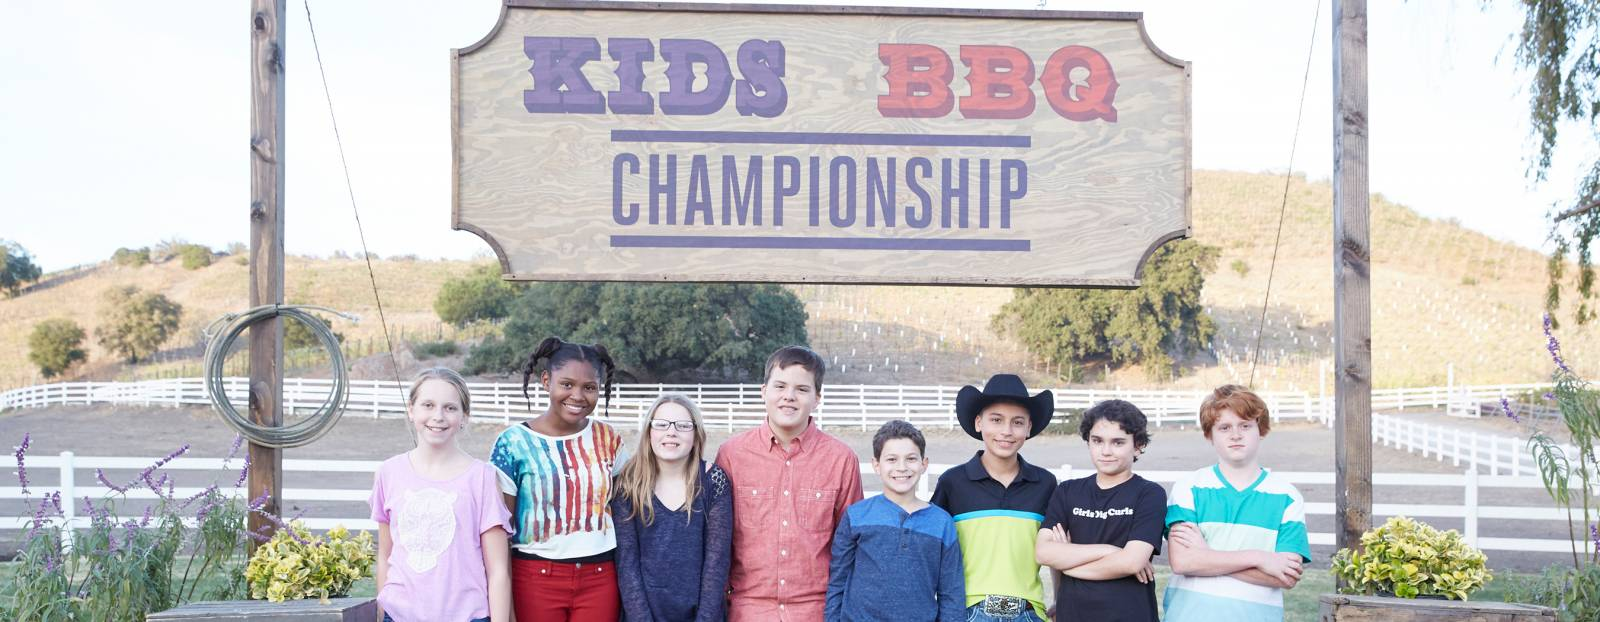 When Will Kids Baking Championship Season 5 Start? Food Network Release Date